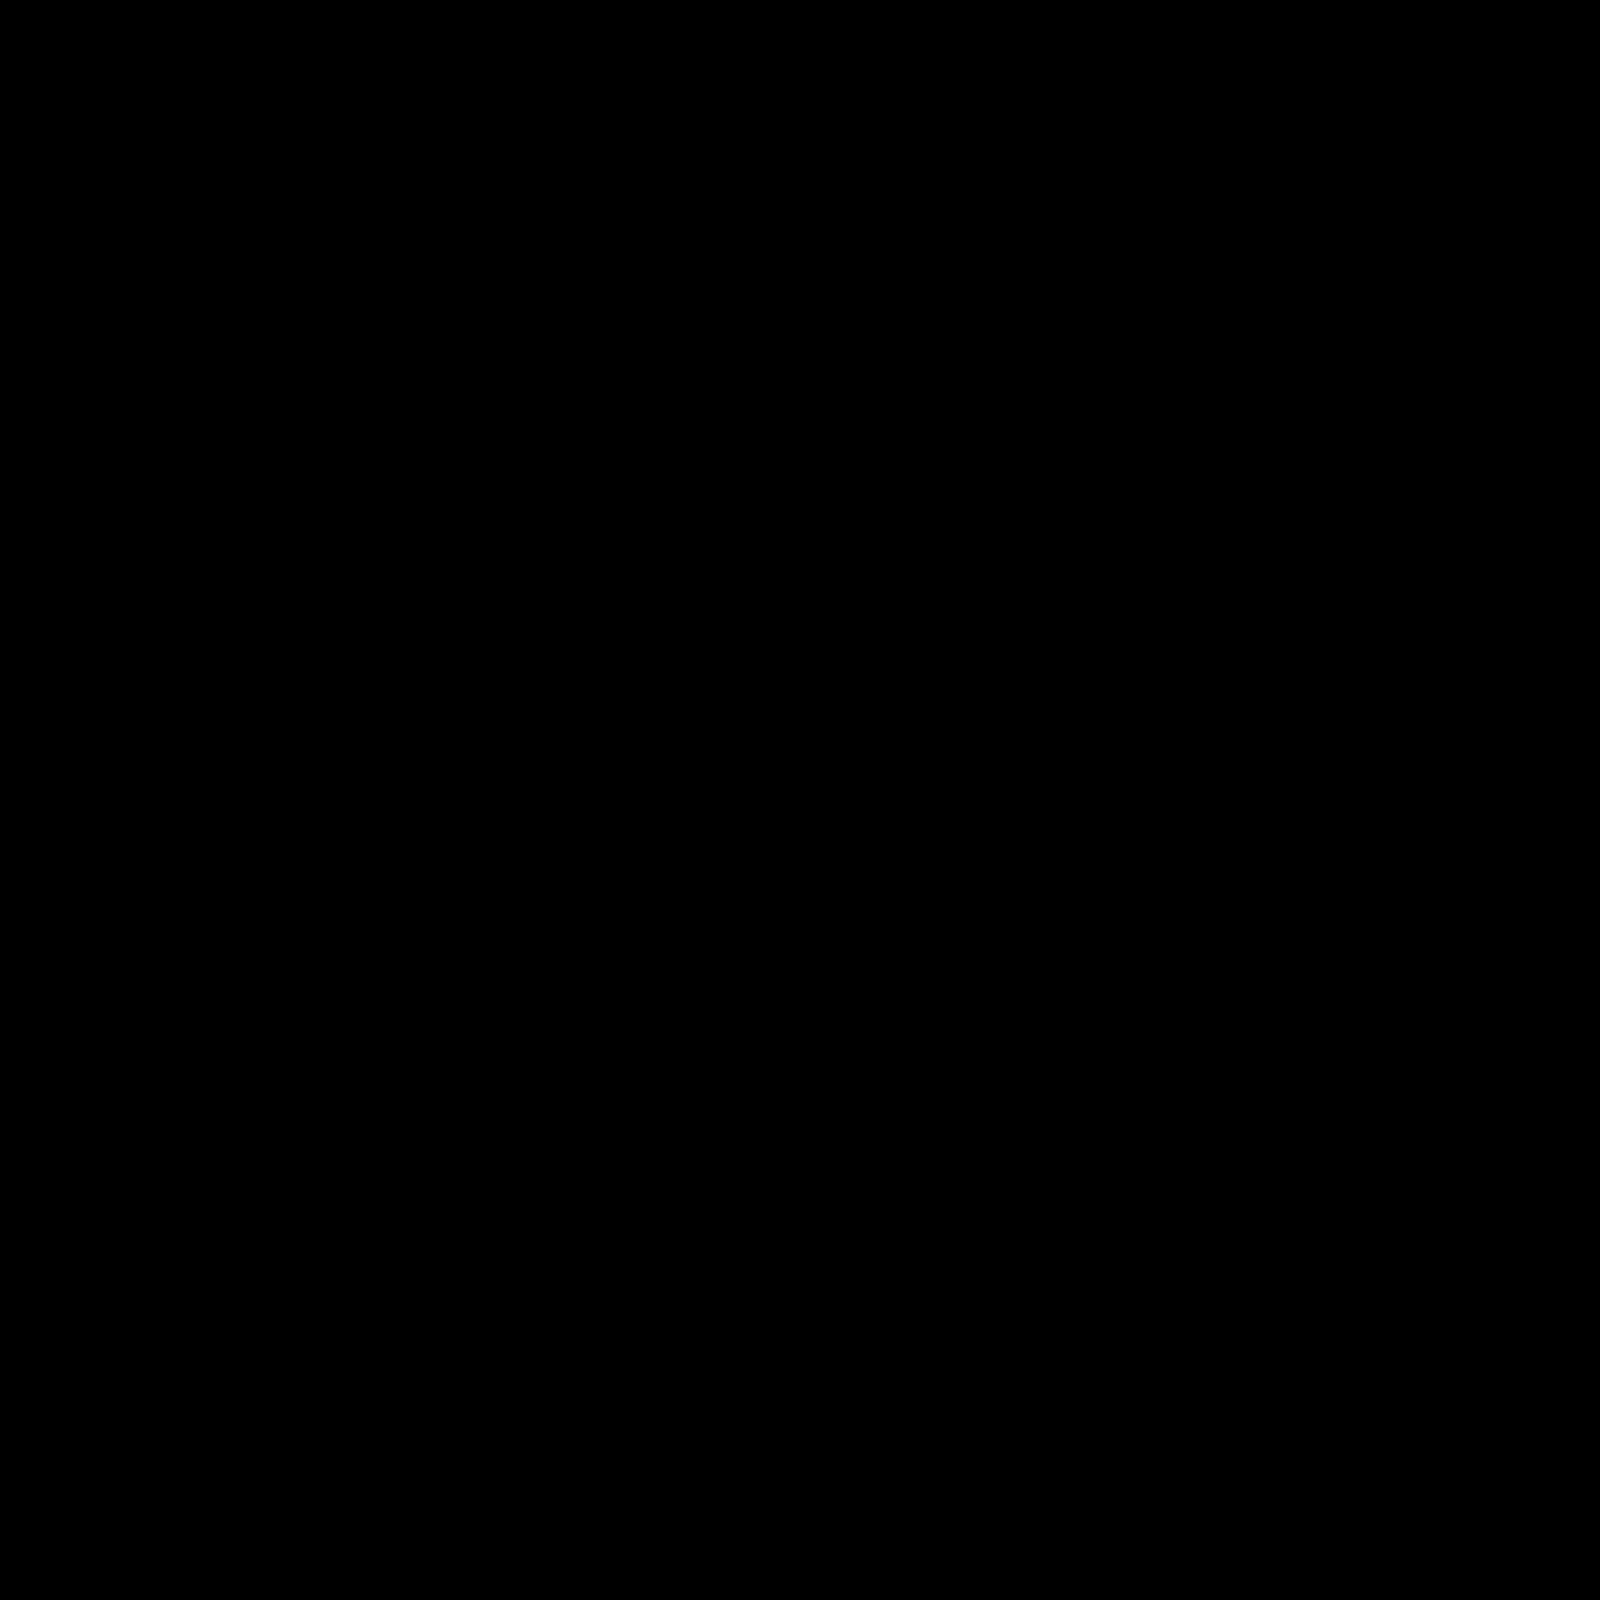 verfolgen icon